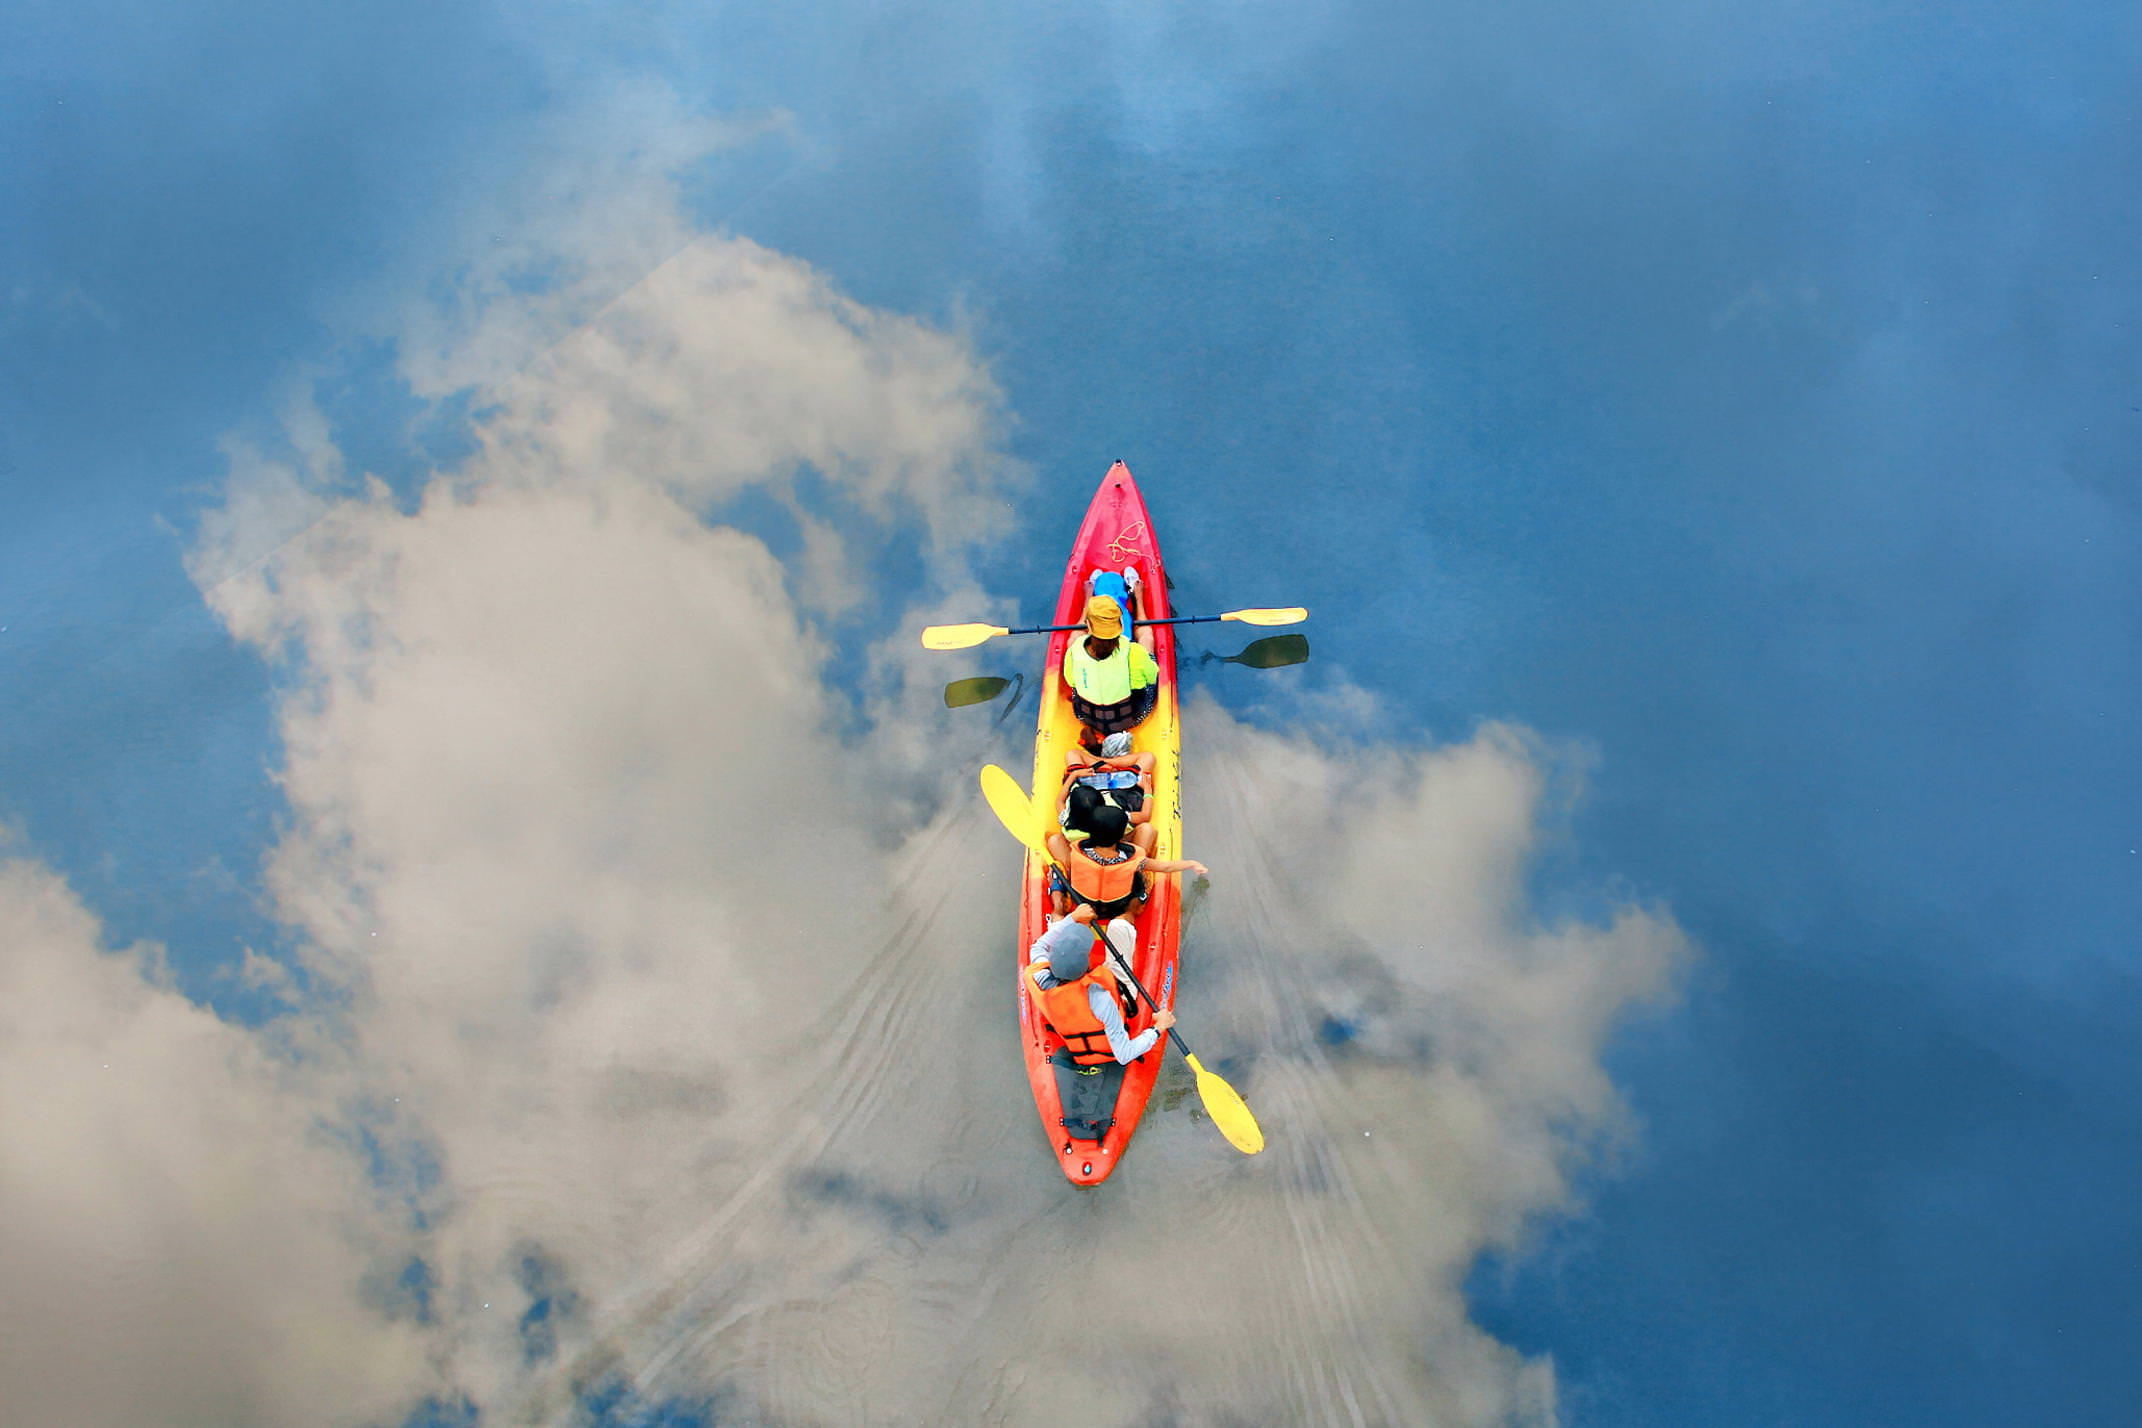 Spain picos de europa canoeing overhead photo